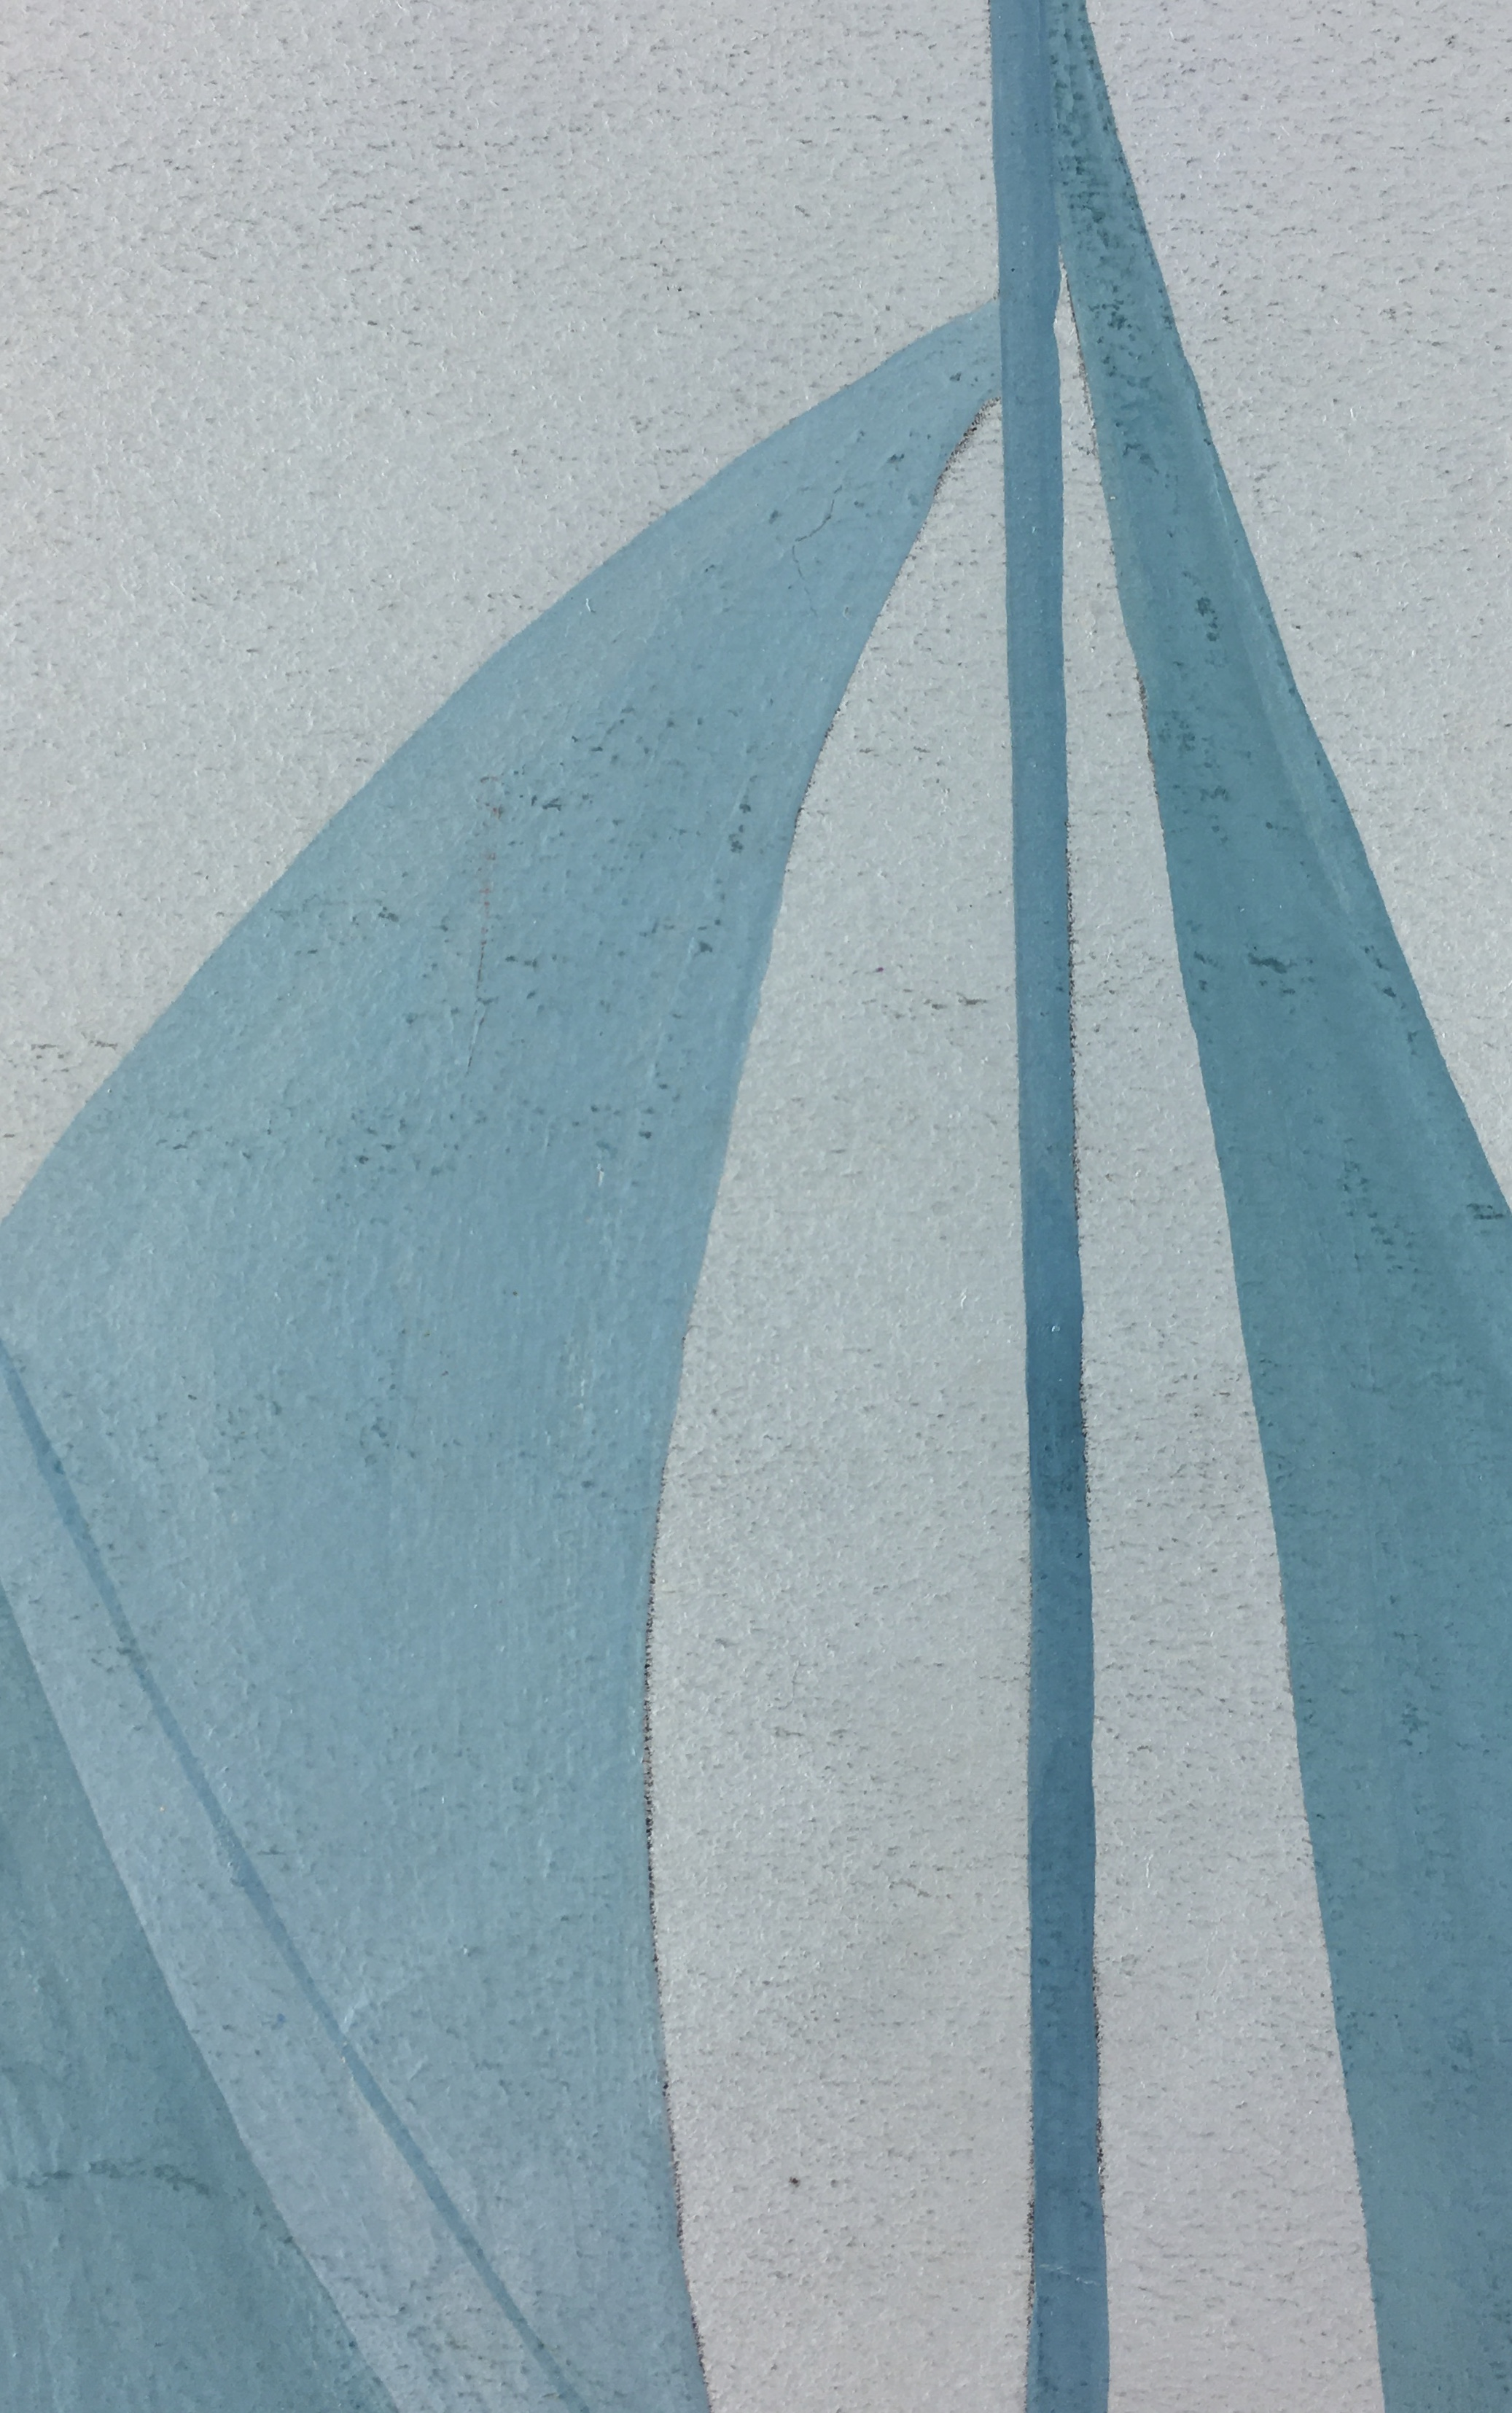 Maritime Original Art - Sails and Cattails, c.1960